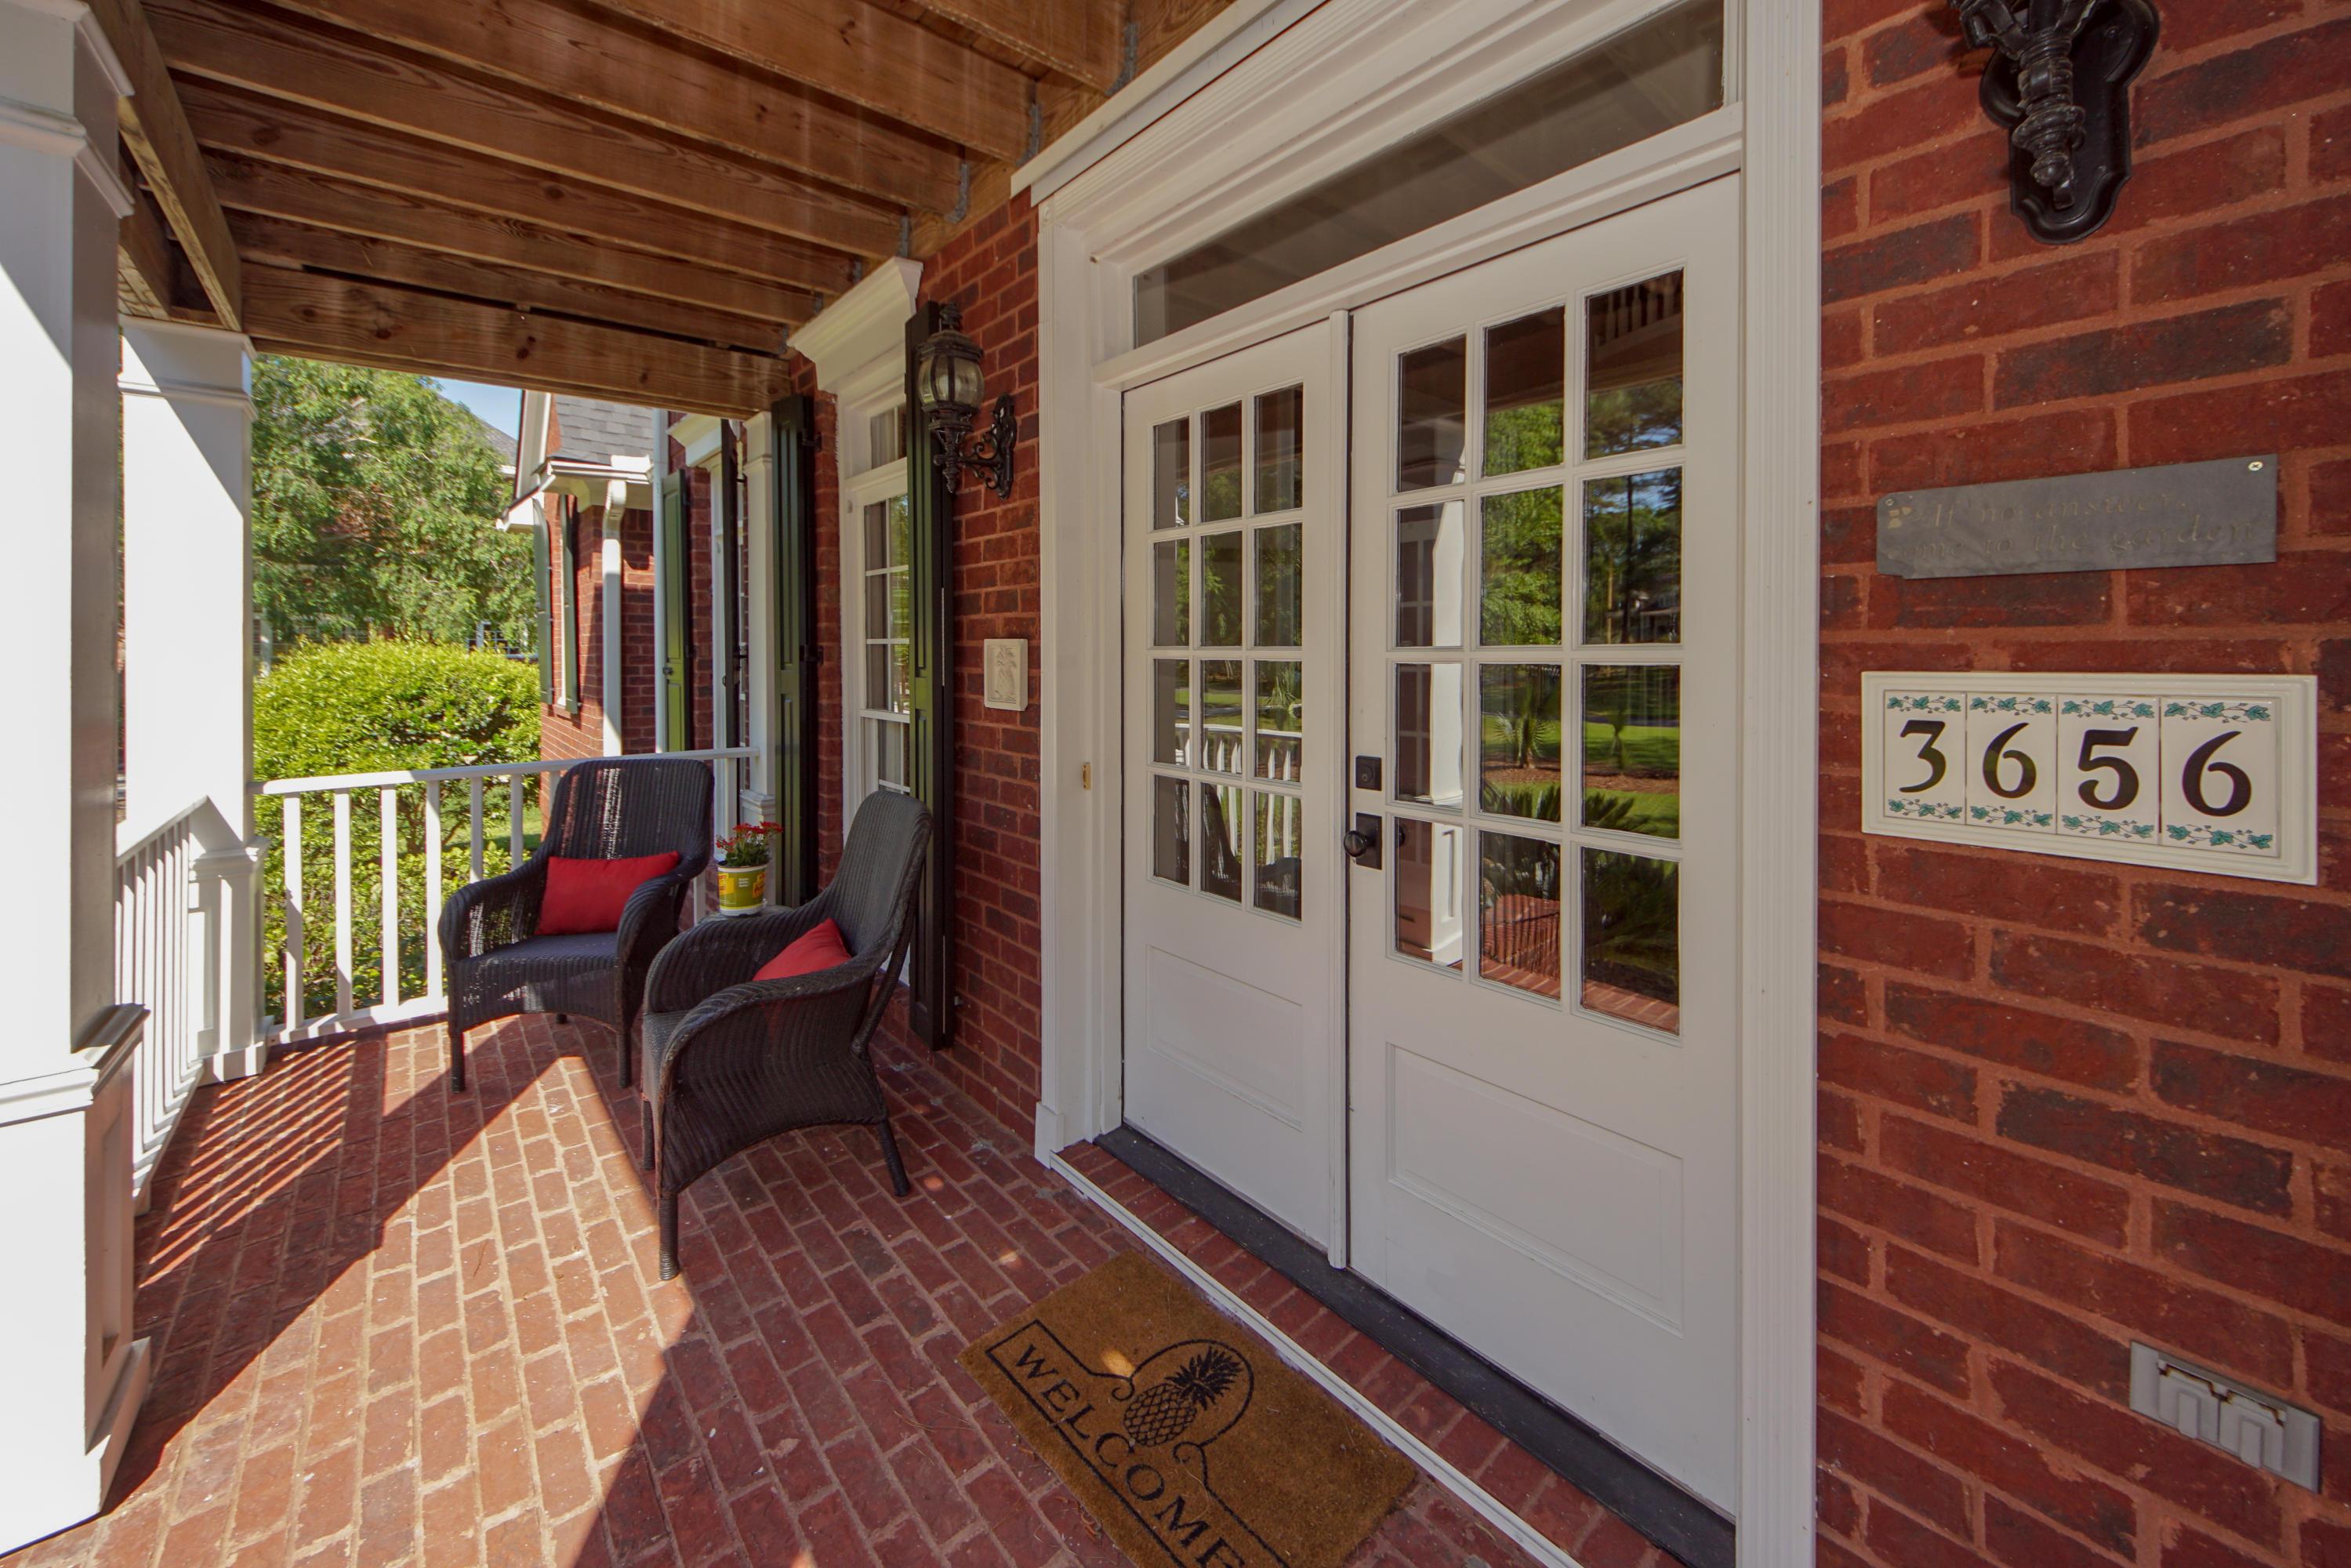 Dunes West Homes For Sale - 3656 Colonel Vanderhorst, Mount Pleasant, SC - 54